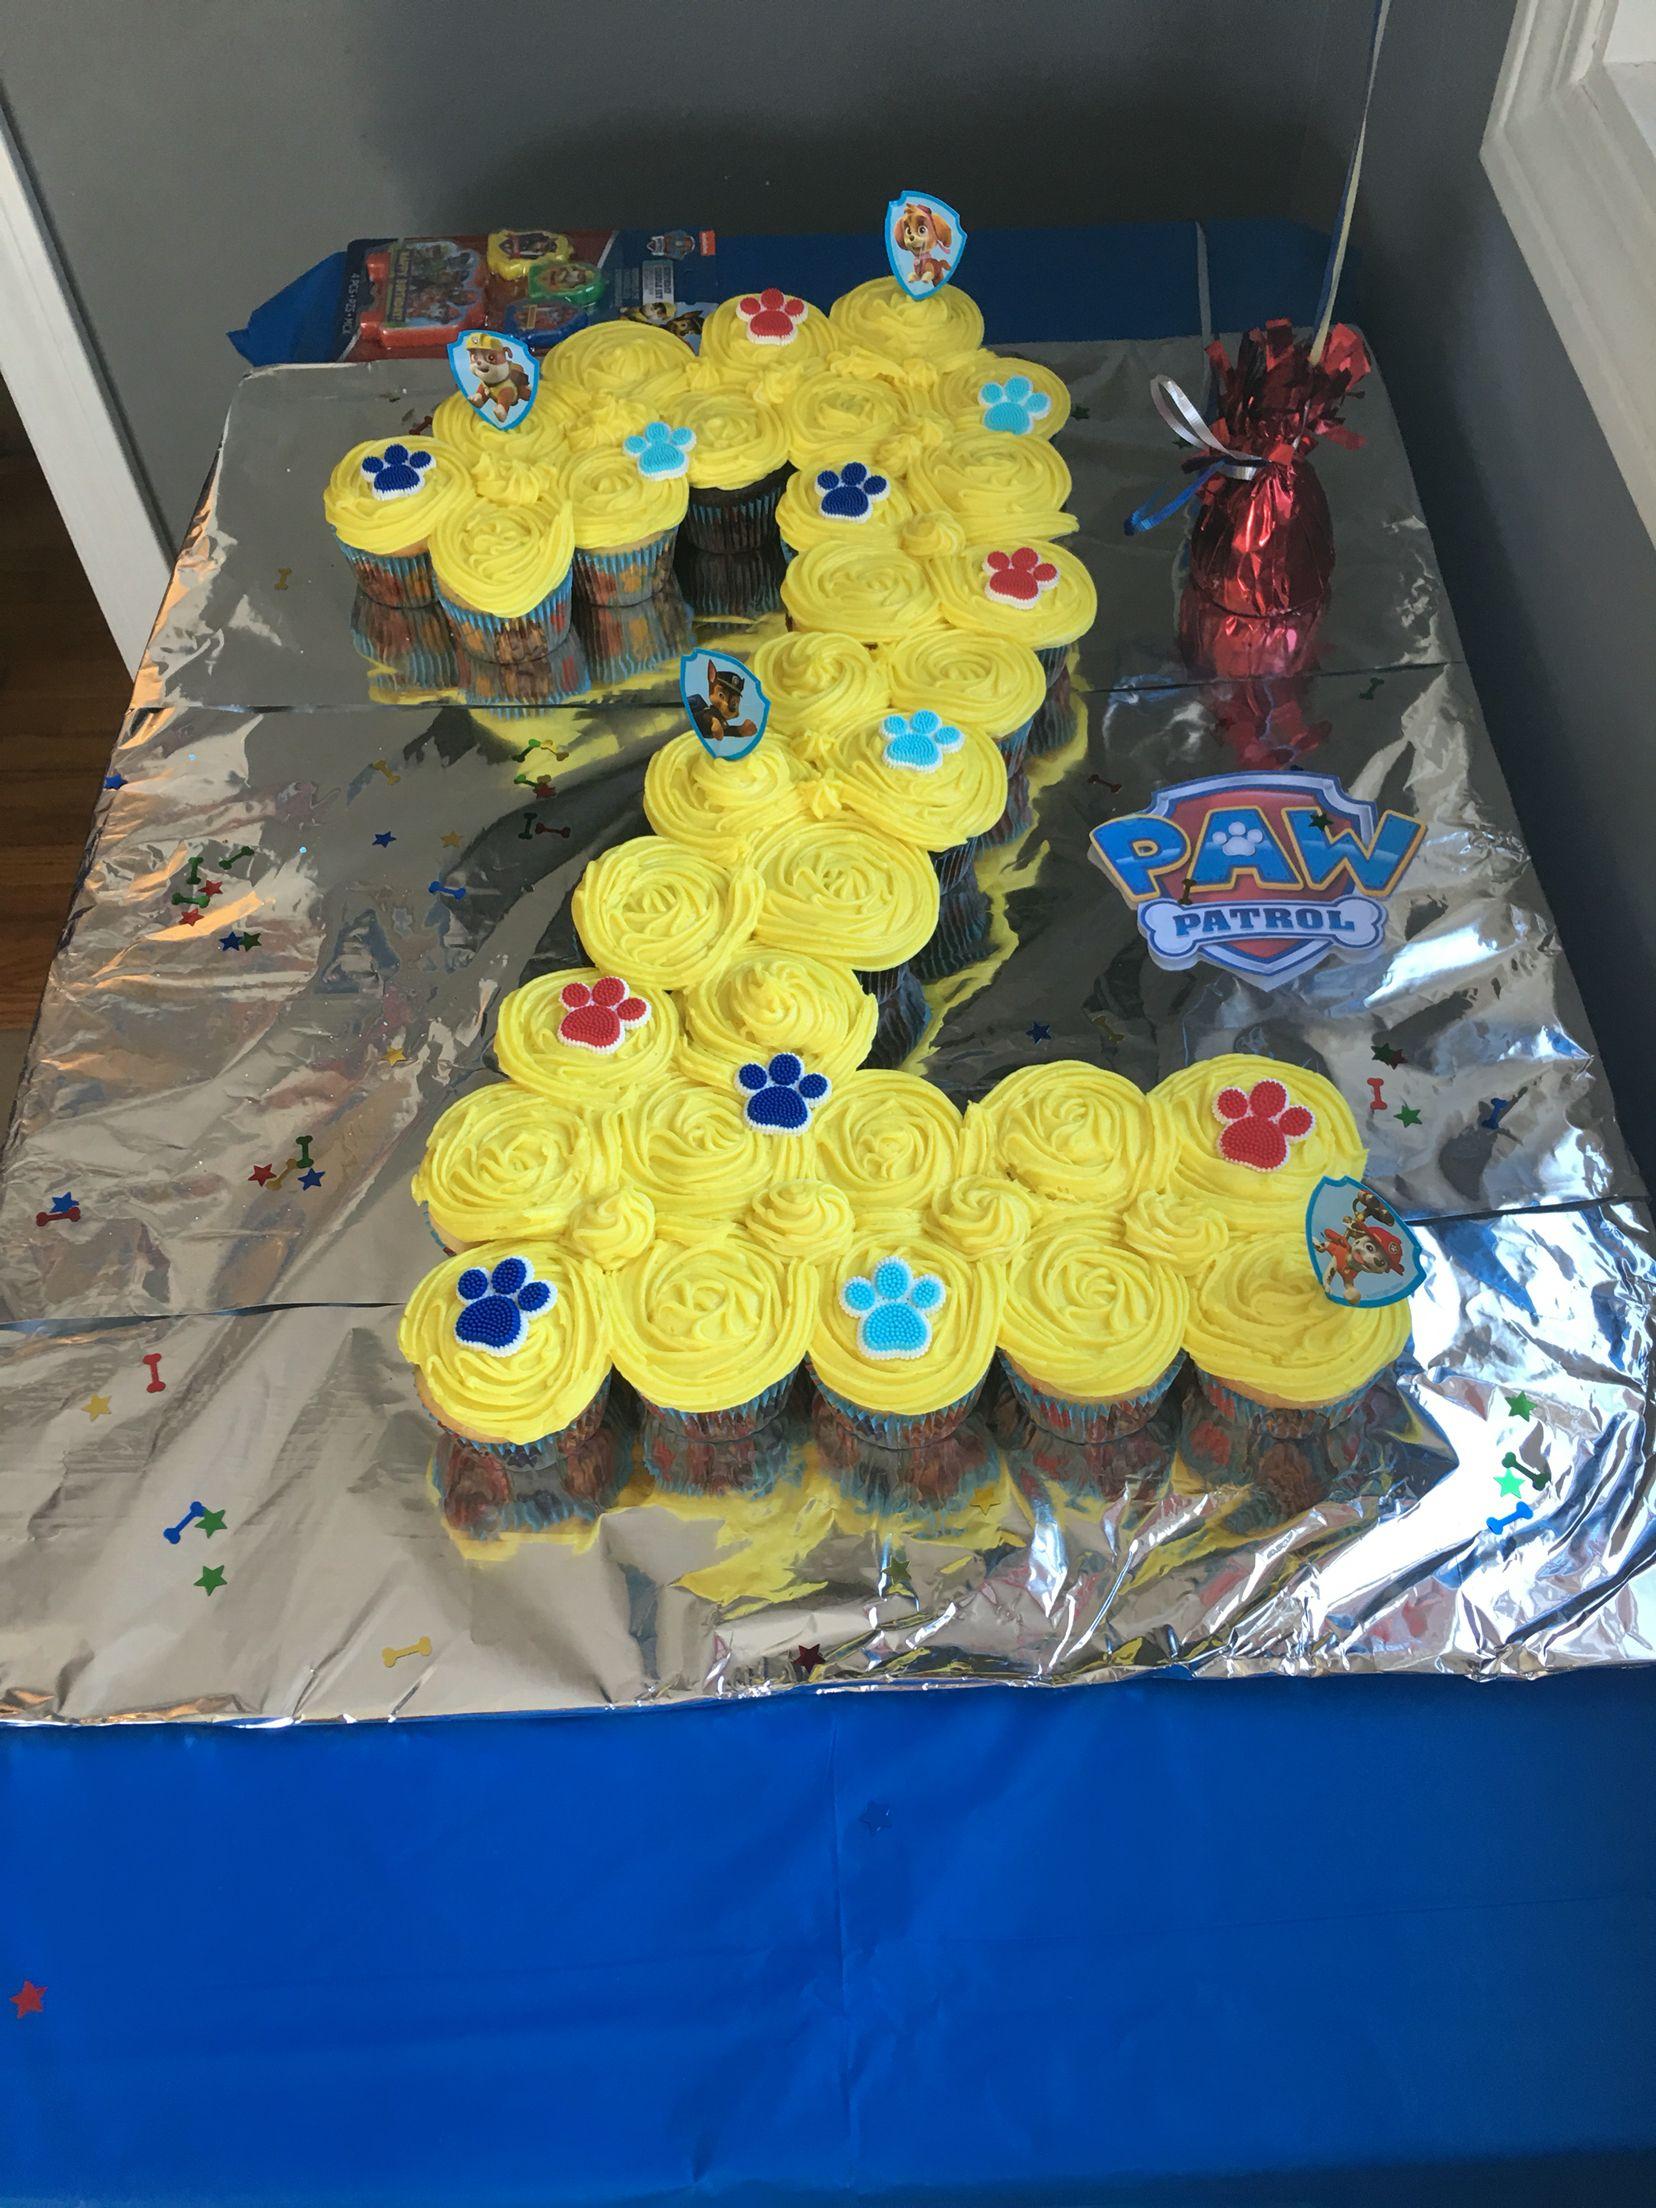 Paw Patrol Cupcake Cake With Images Birthday Party Cake Paw